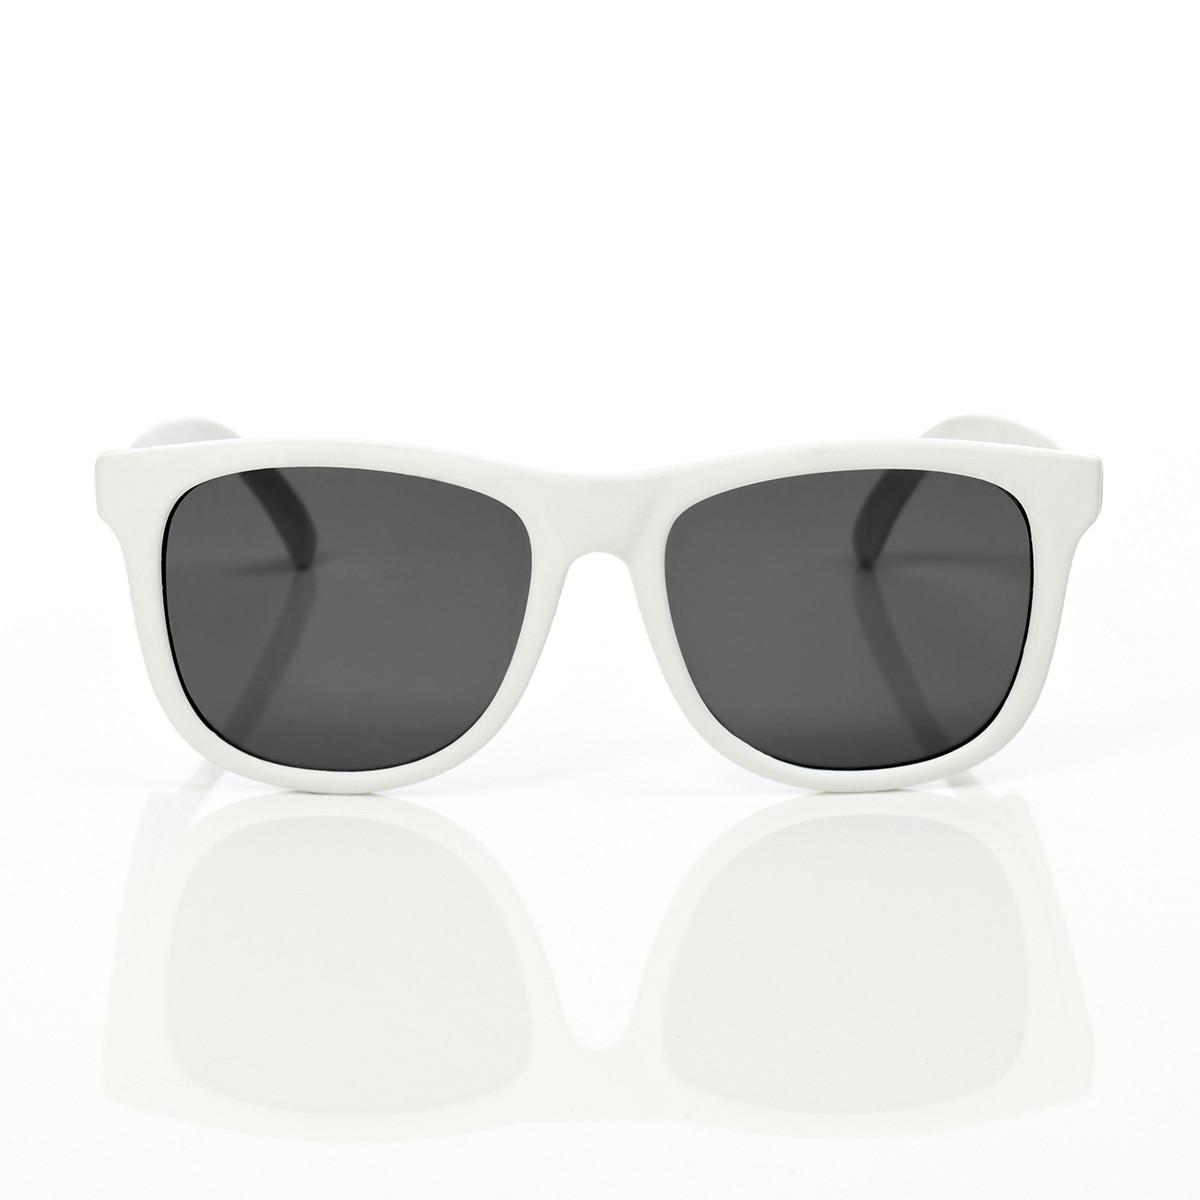 Mustachifier White Sunglasses Age 3-6 แว่นกันแดดเด็กสีขาว